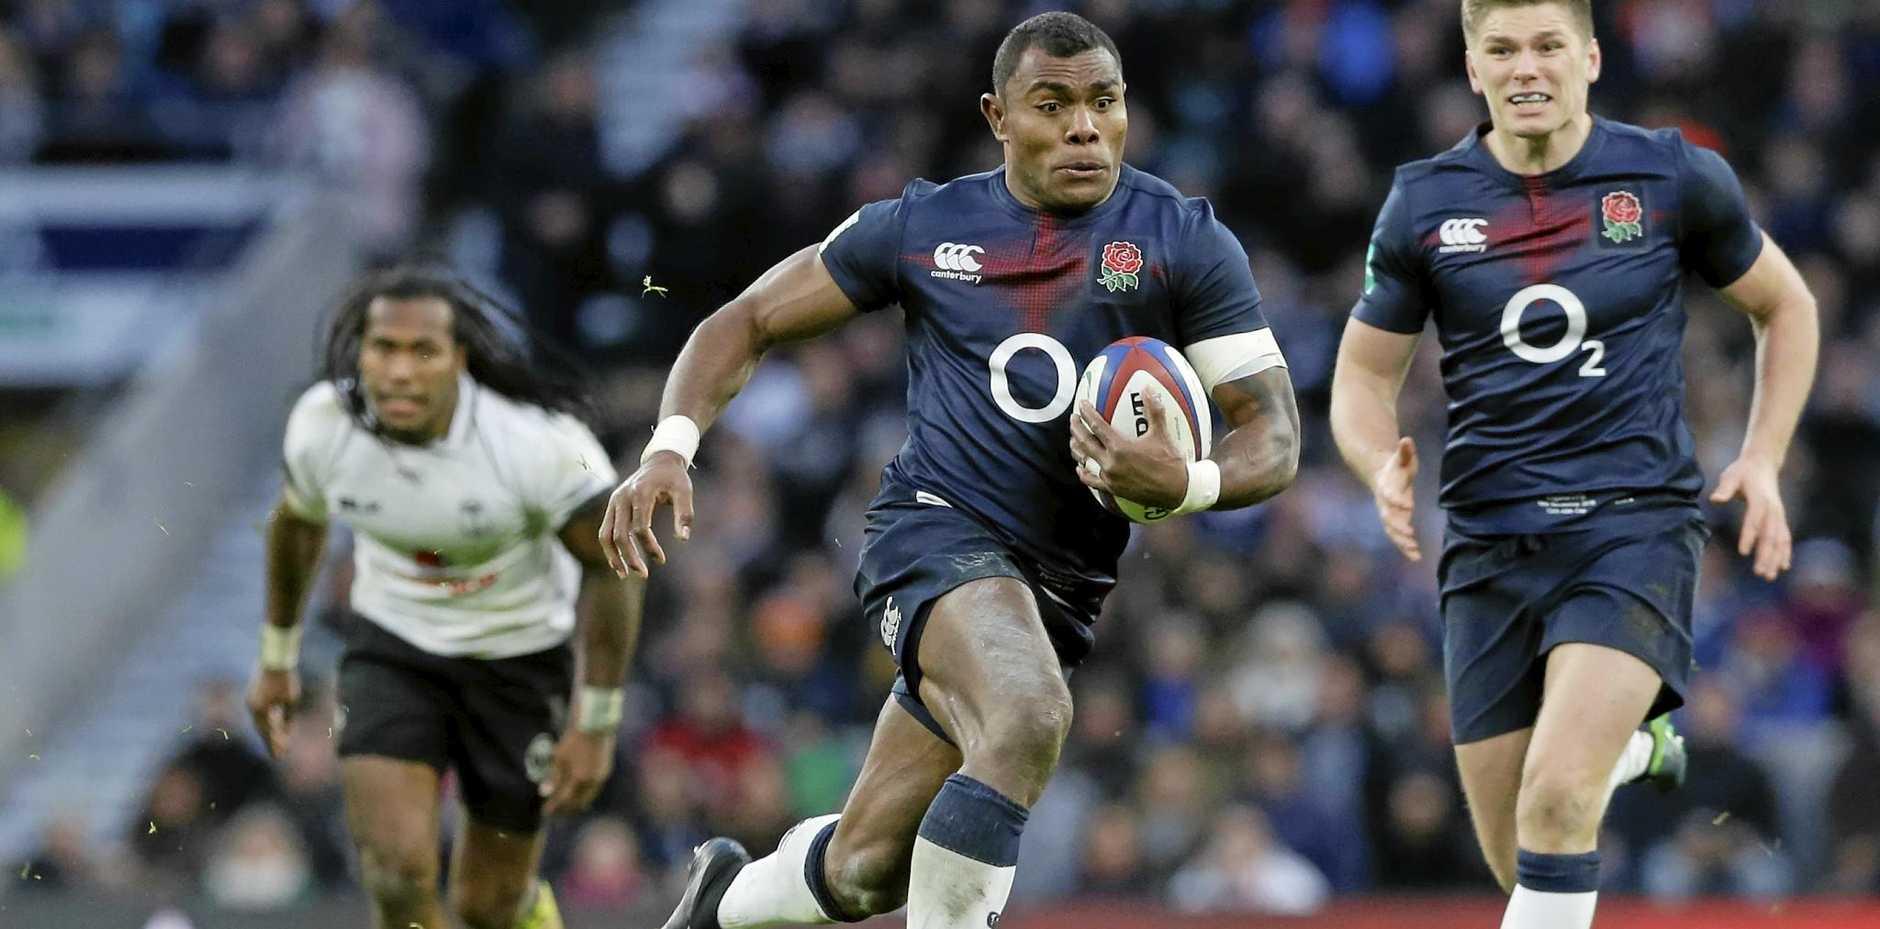 England's Semesa Rokoduguni gets away from the Fijian defence at Twickenham.